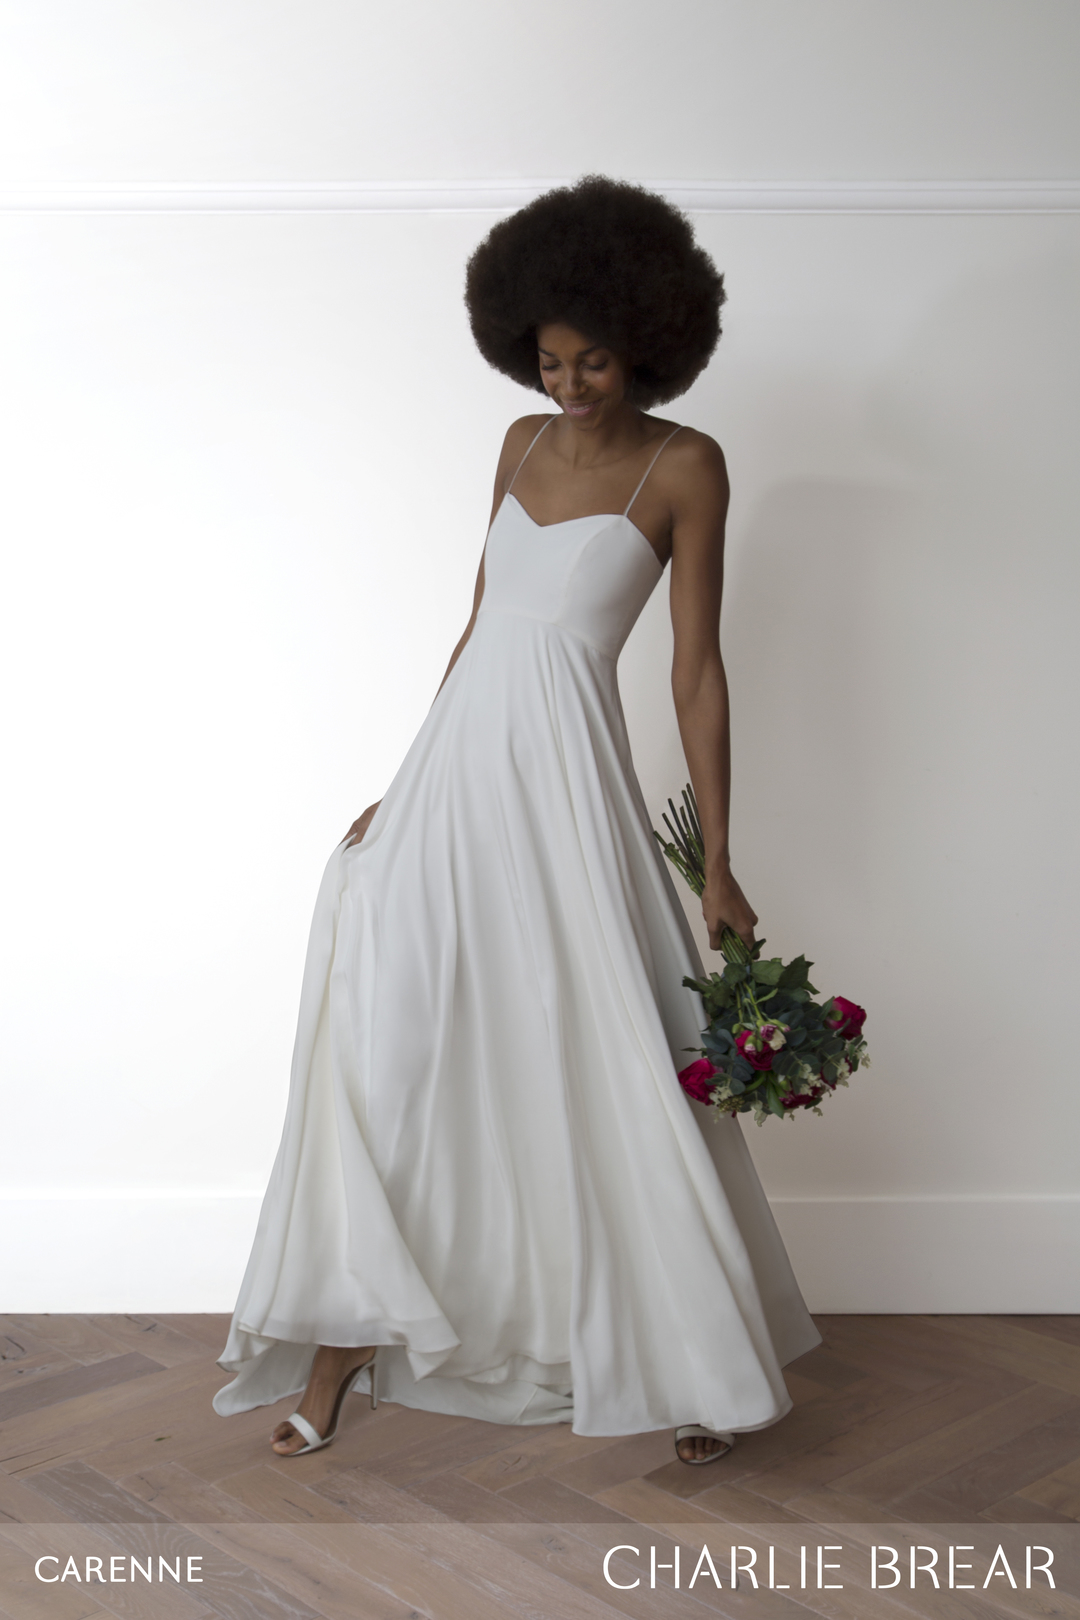 carenne dress photo